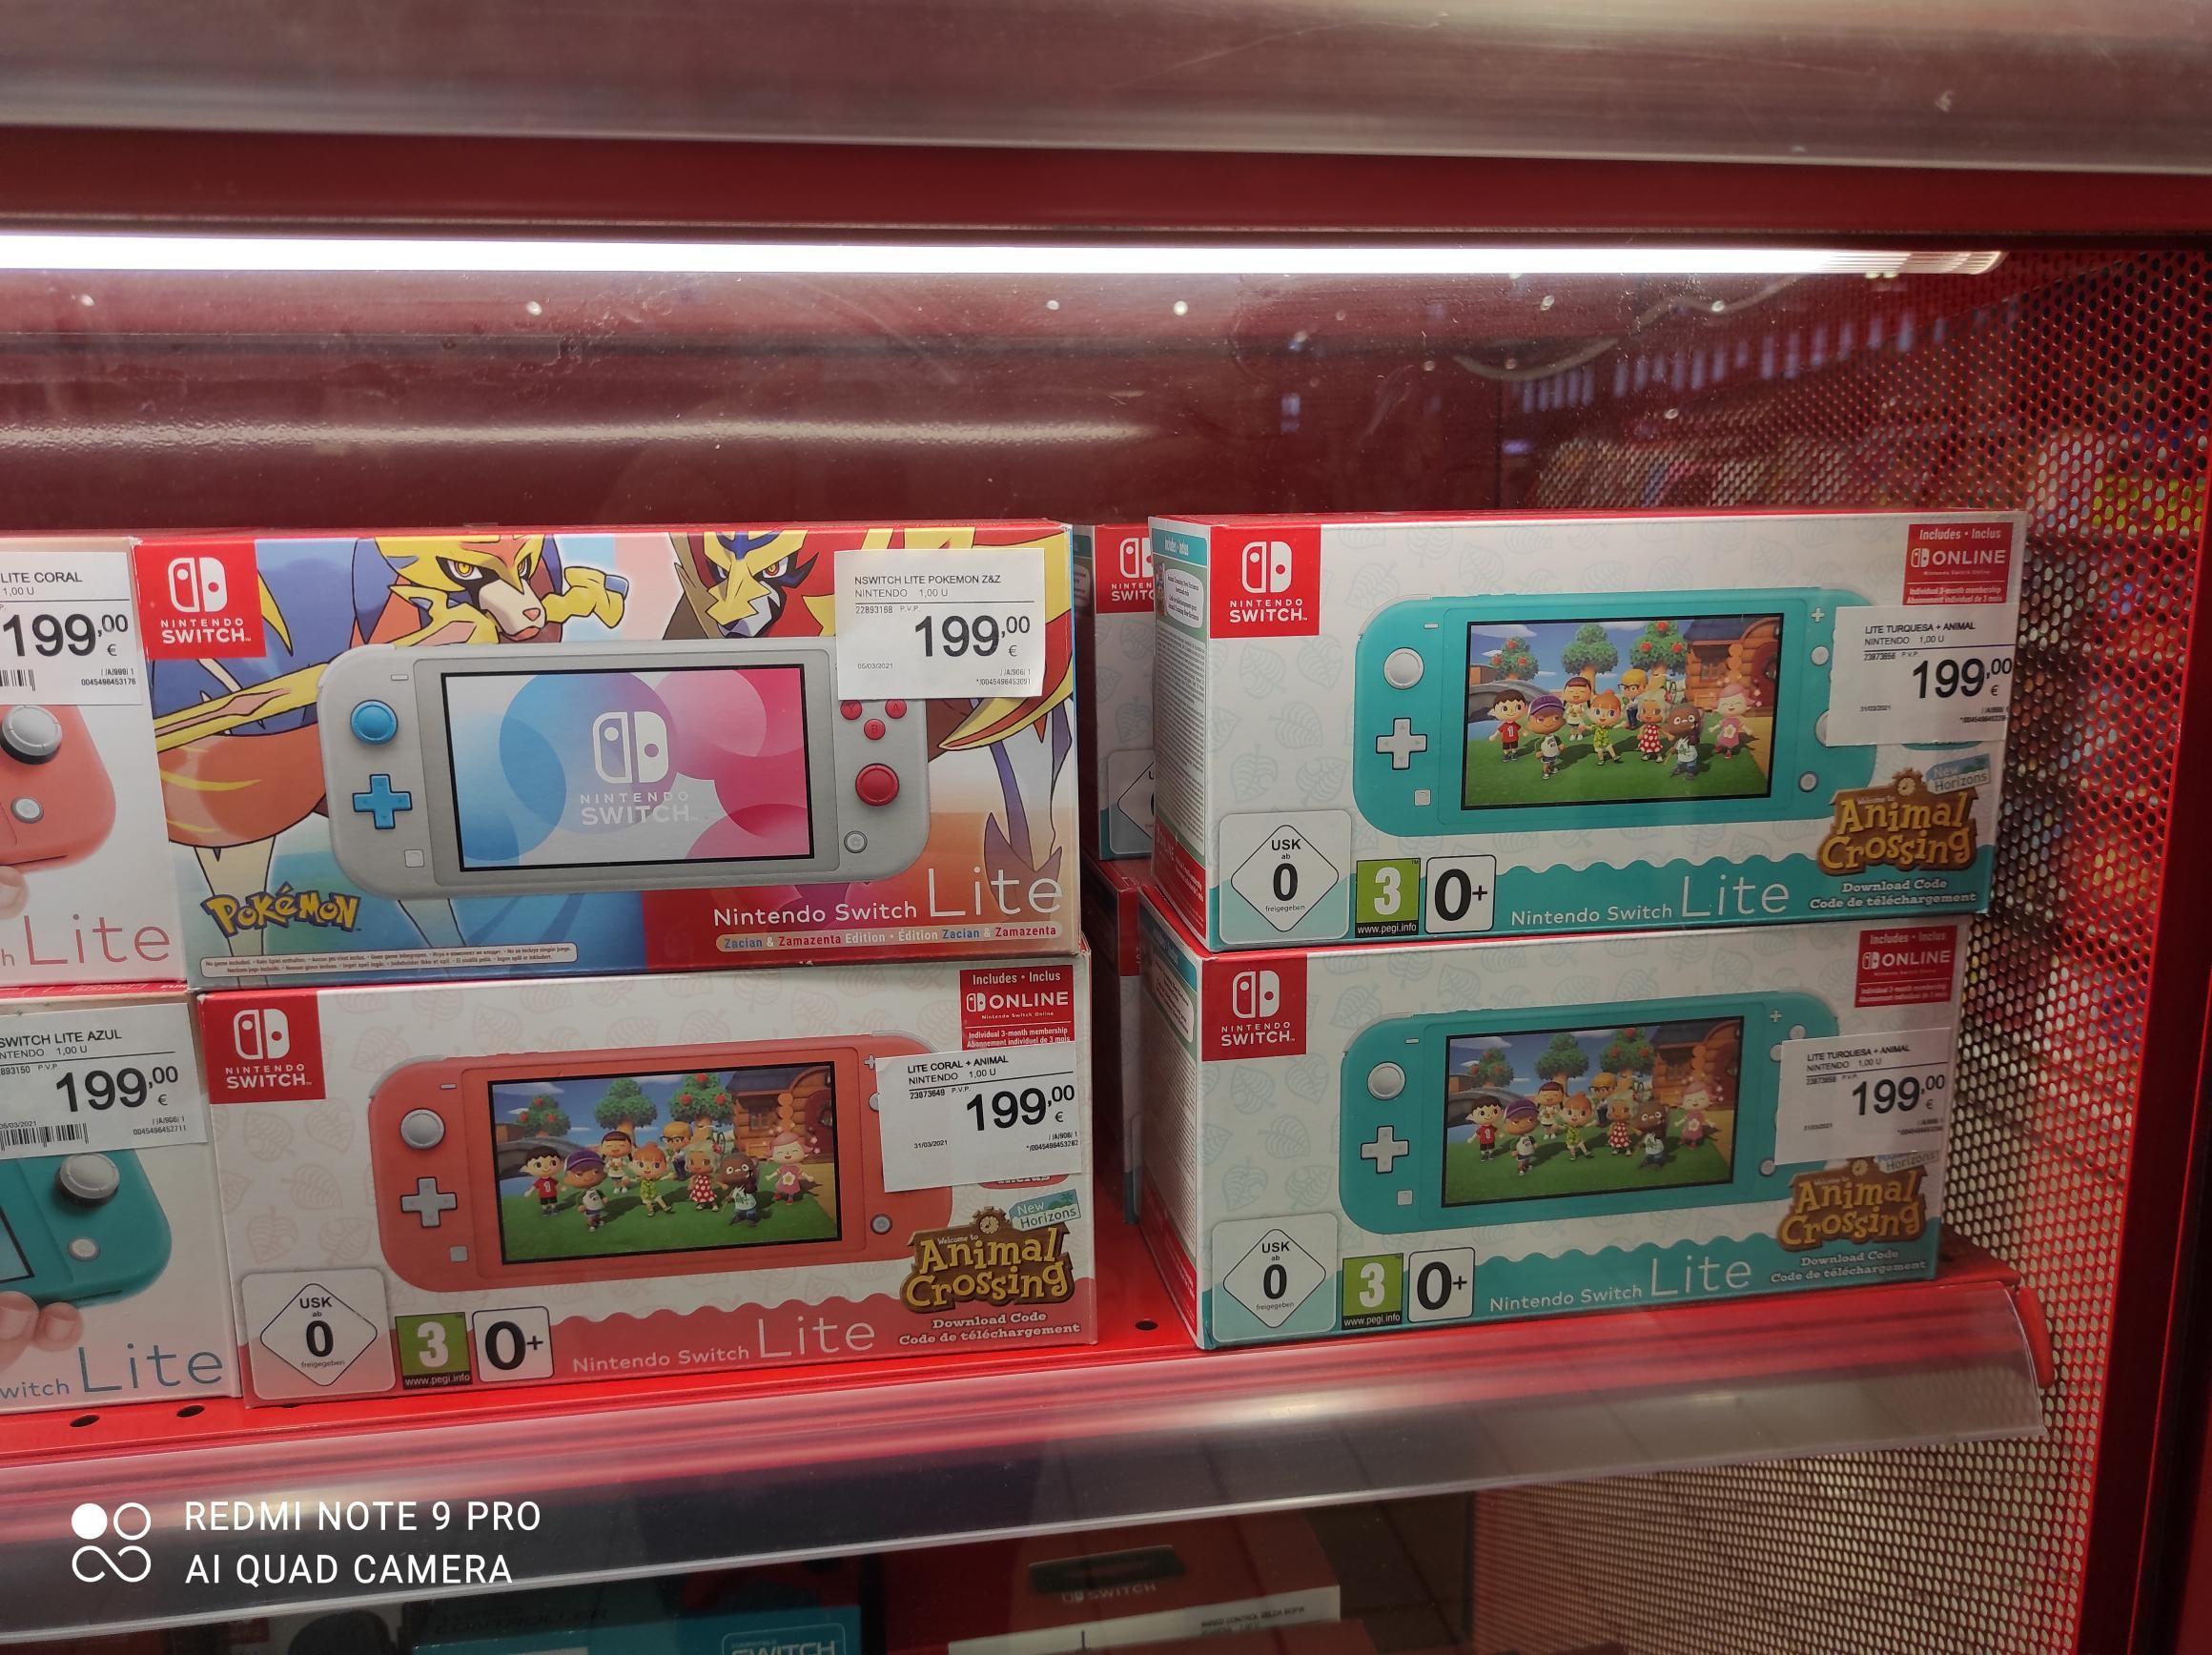 Nintendo switch lite + animal crossing + 3 meses online